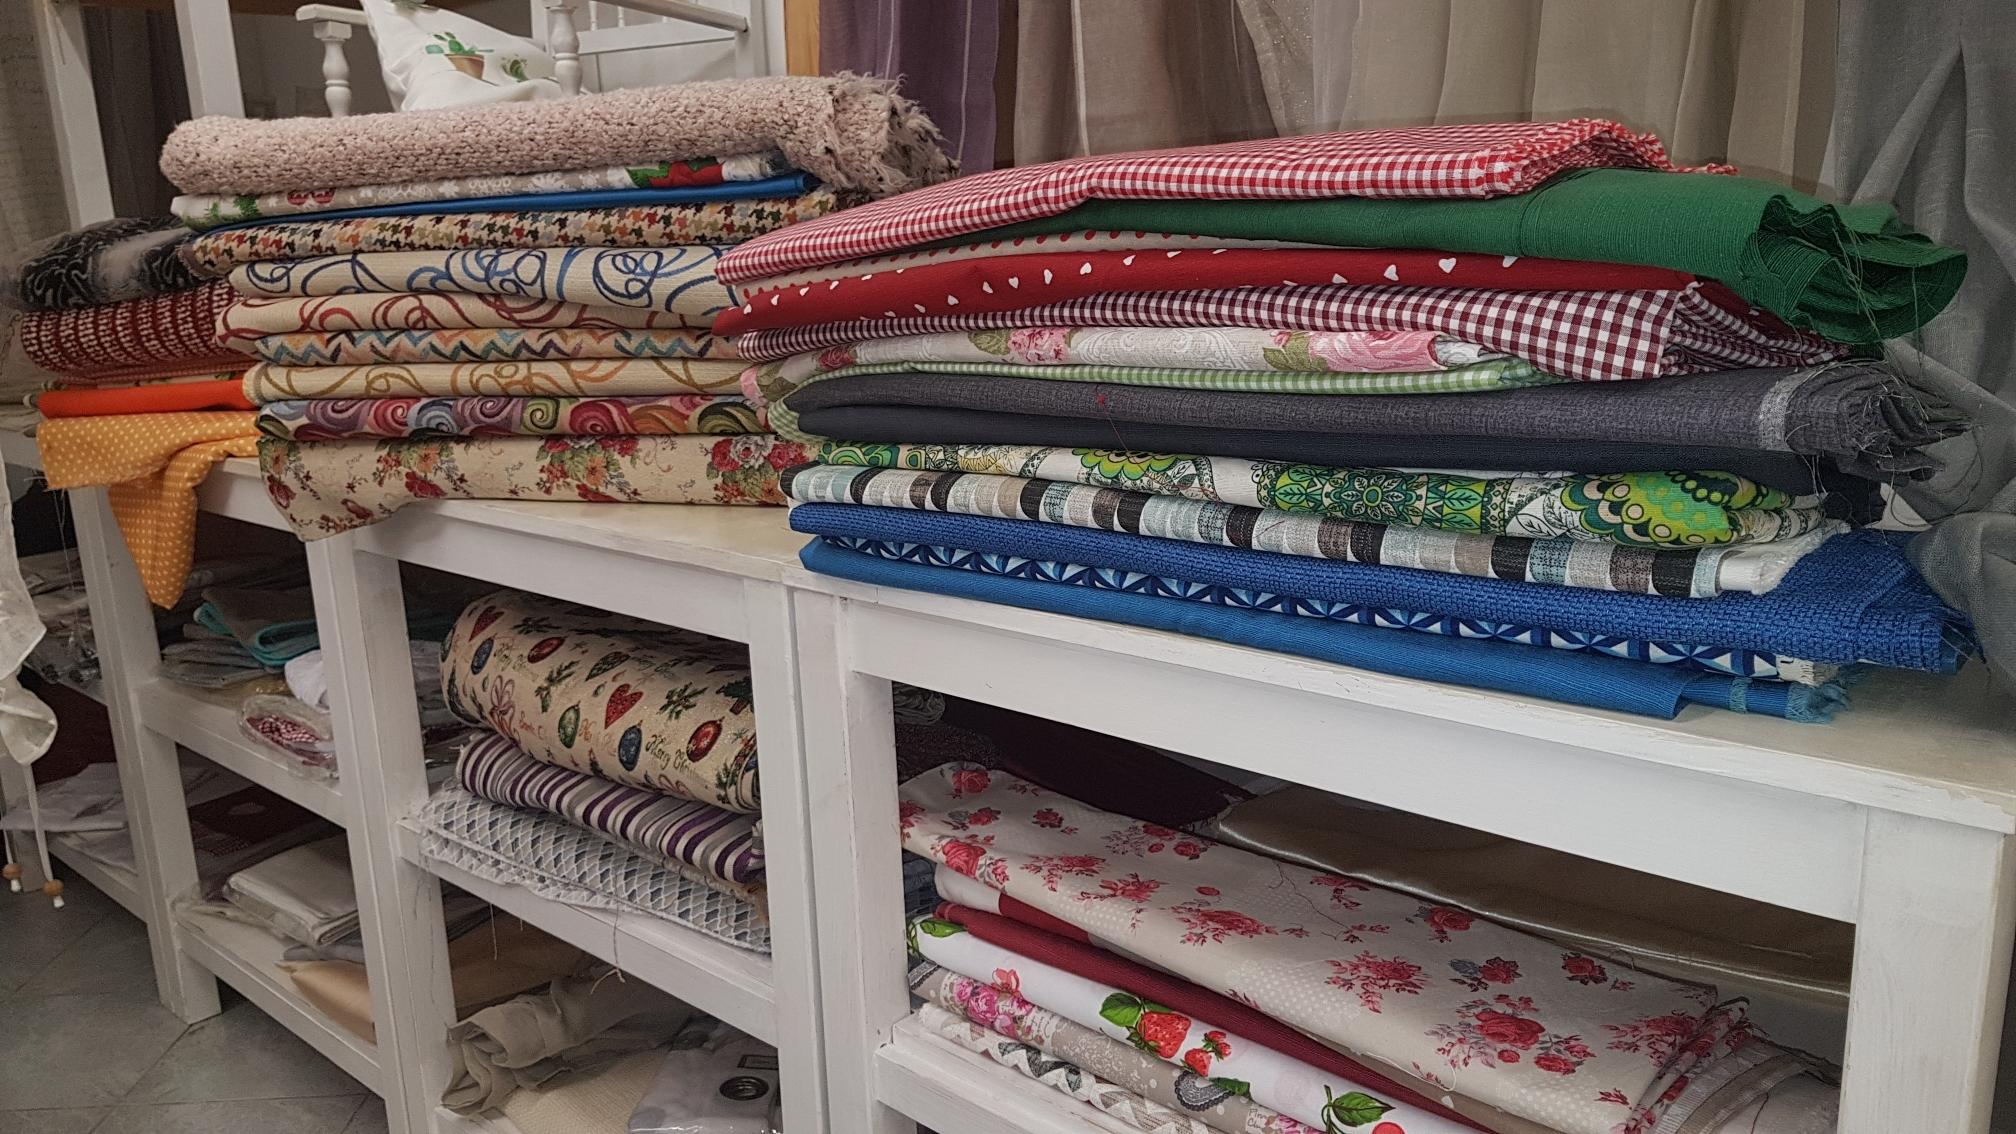 Casa co vendita tessuti tappezzerie vendita tessuti for Vendita tessuti arredamento on line